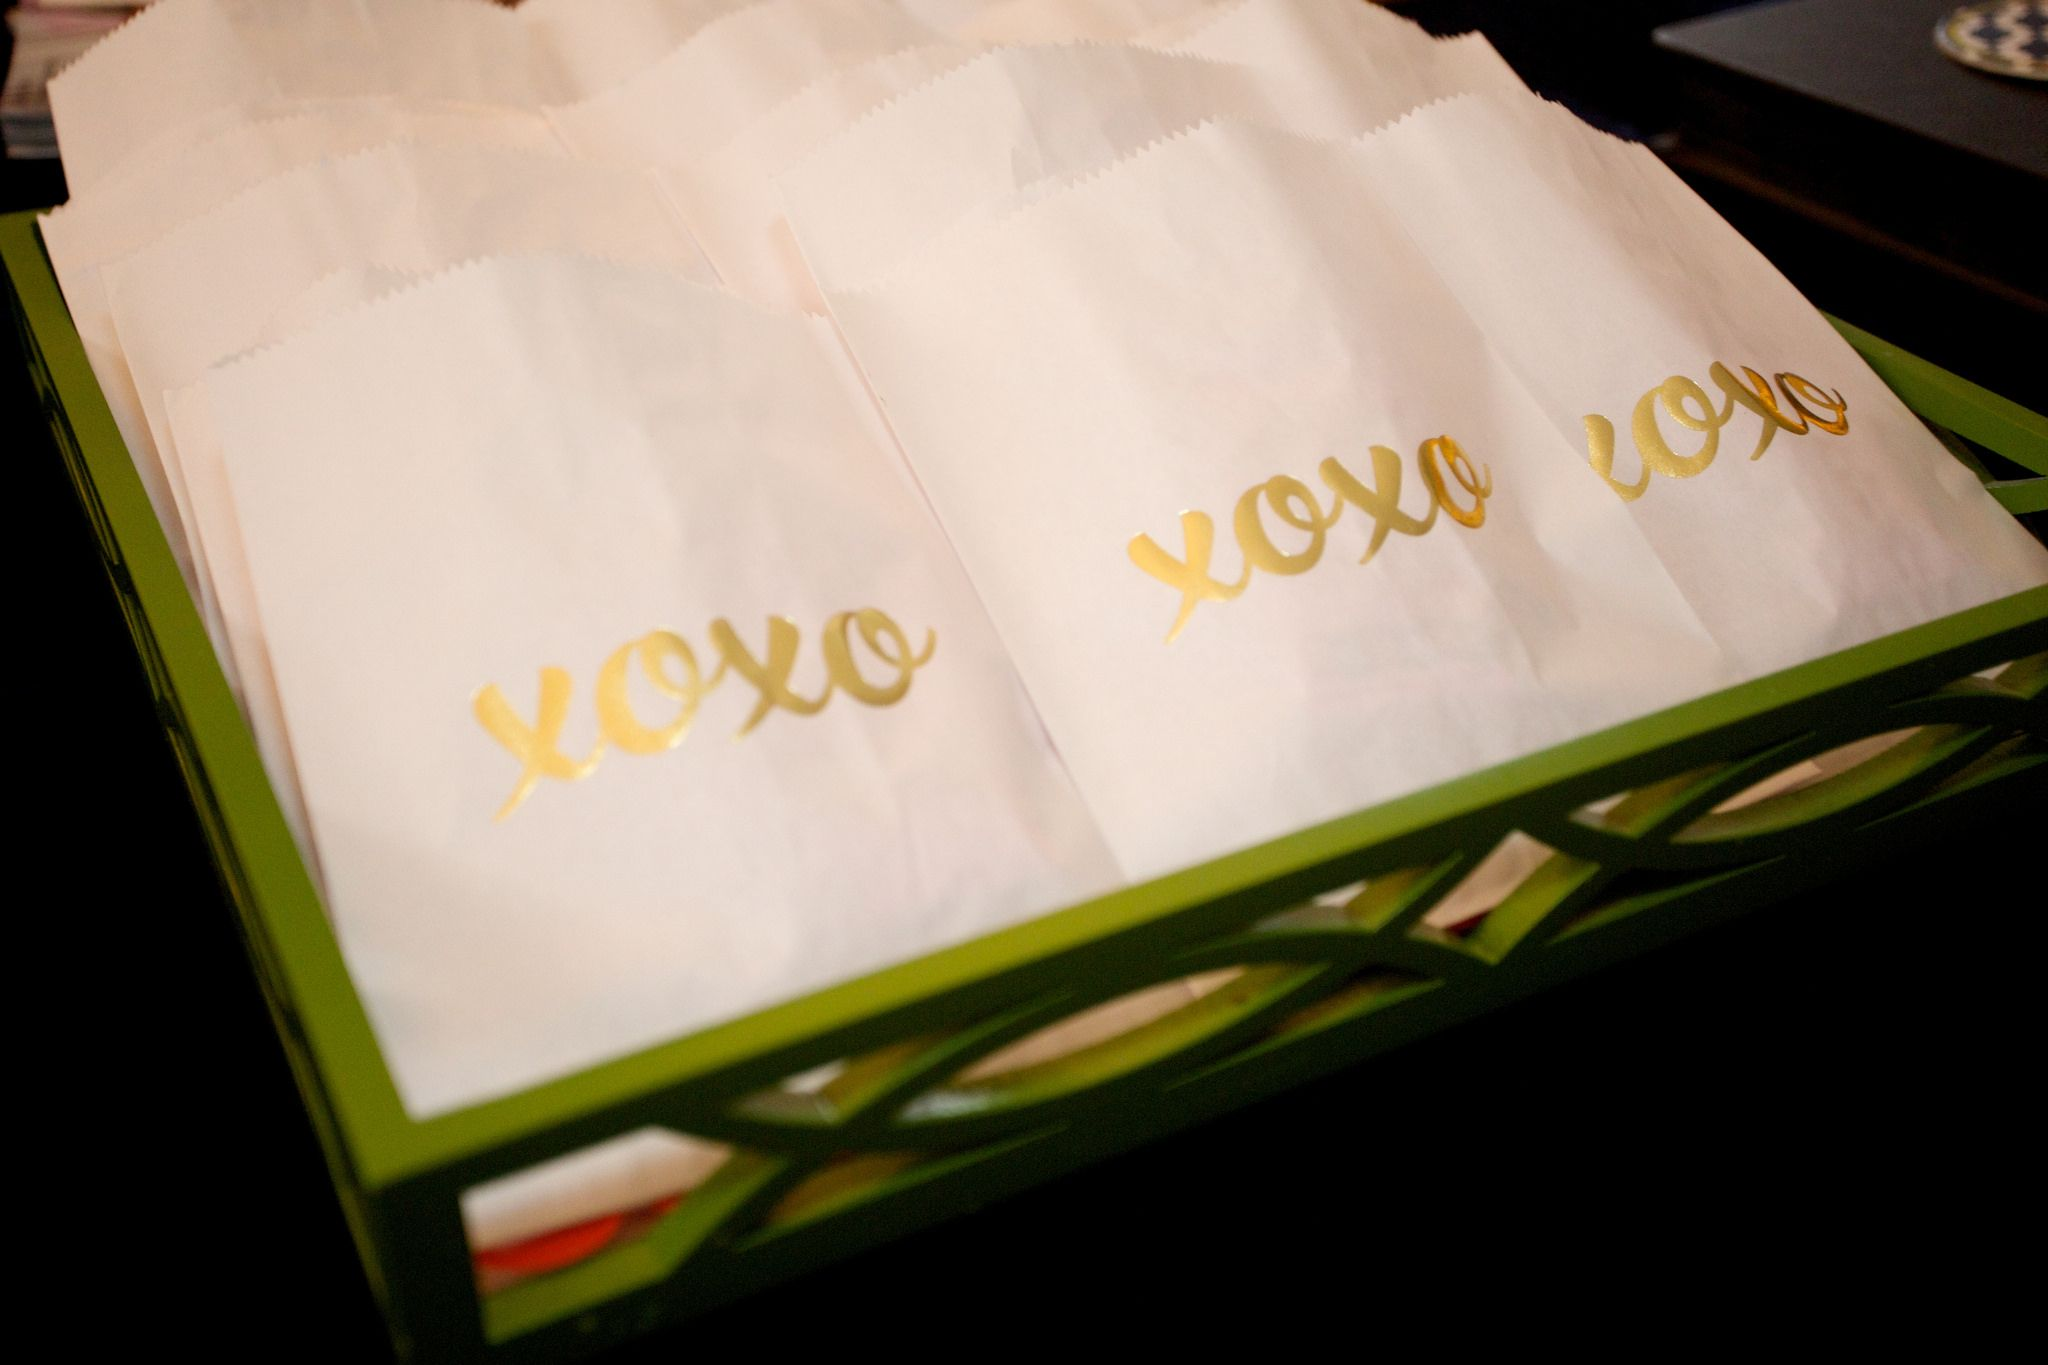 Amazing good bags #birthdayparty #xoxo #hugsandkisses #adorable #partyfavors #wrapitupparties